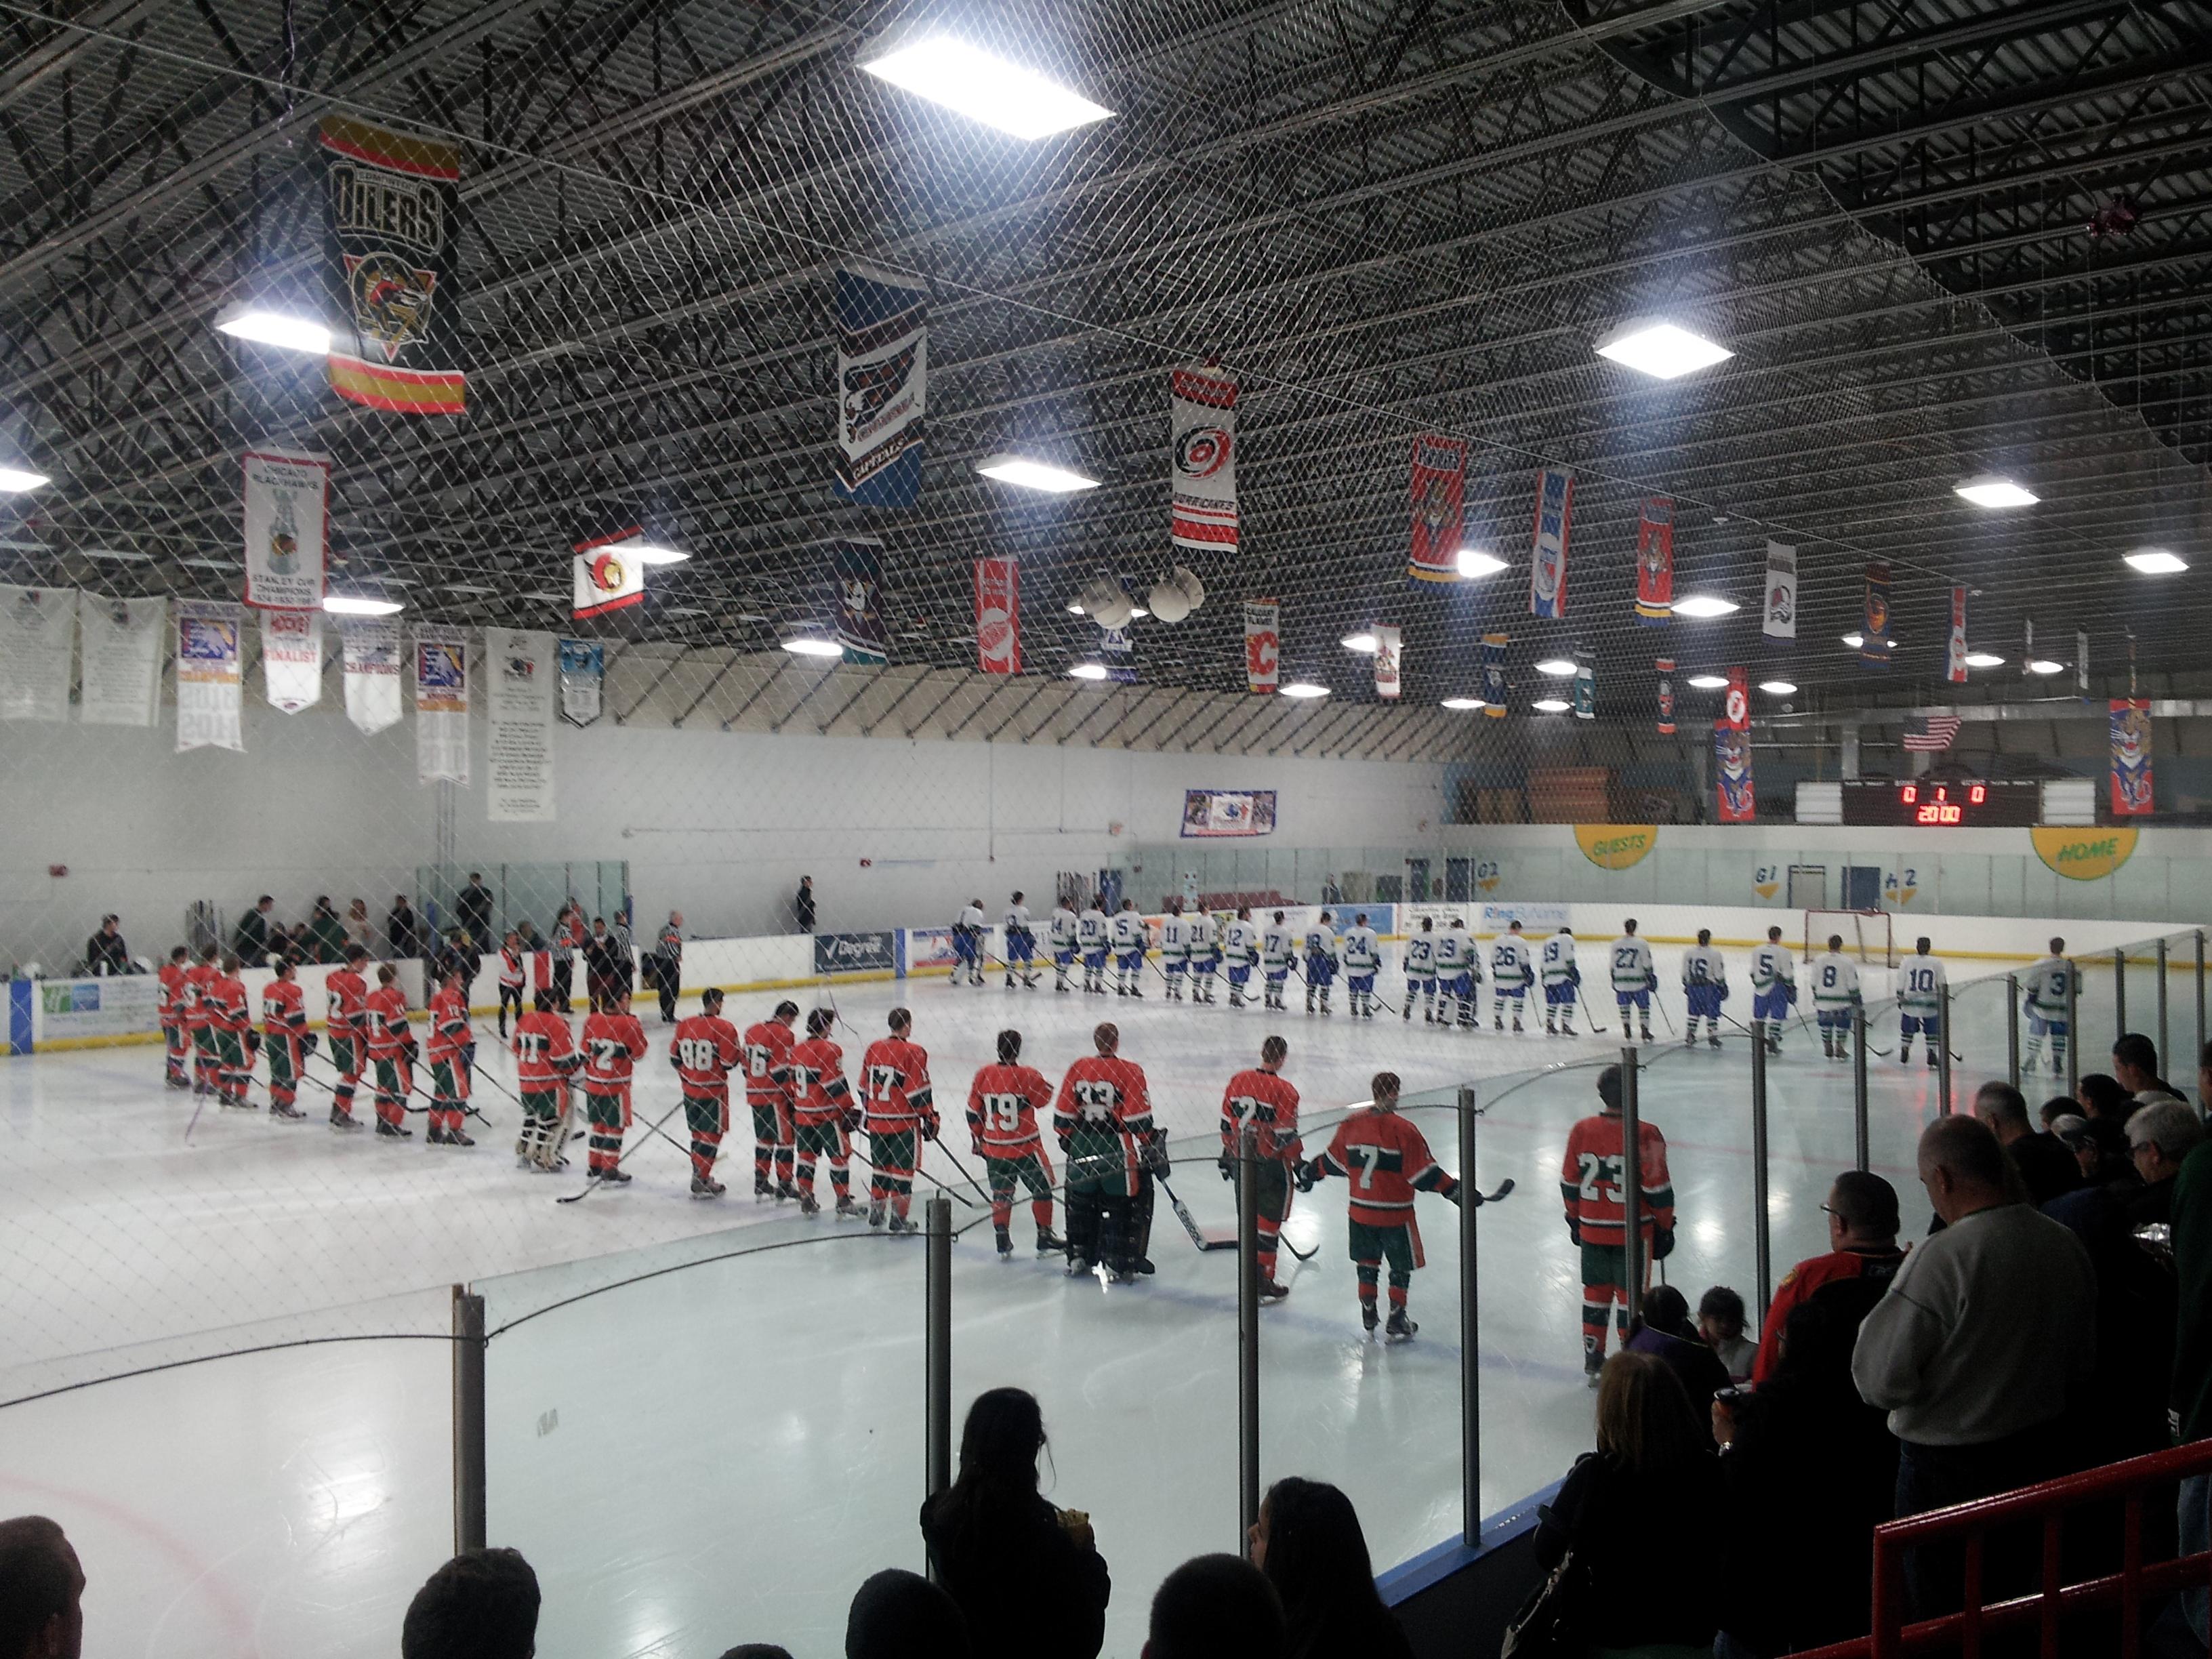 South Florida Ice Hockey